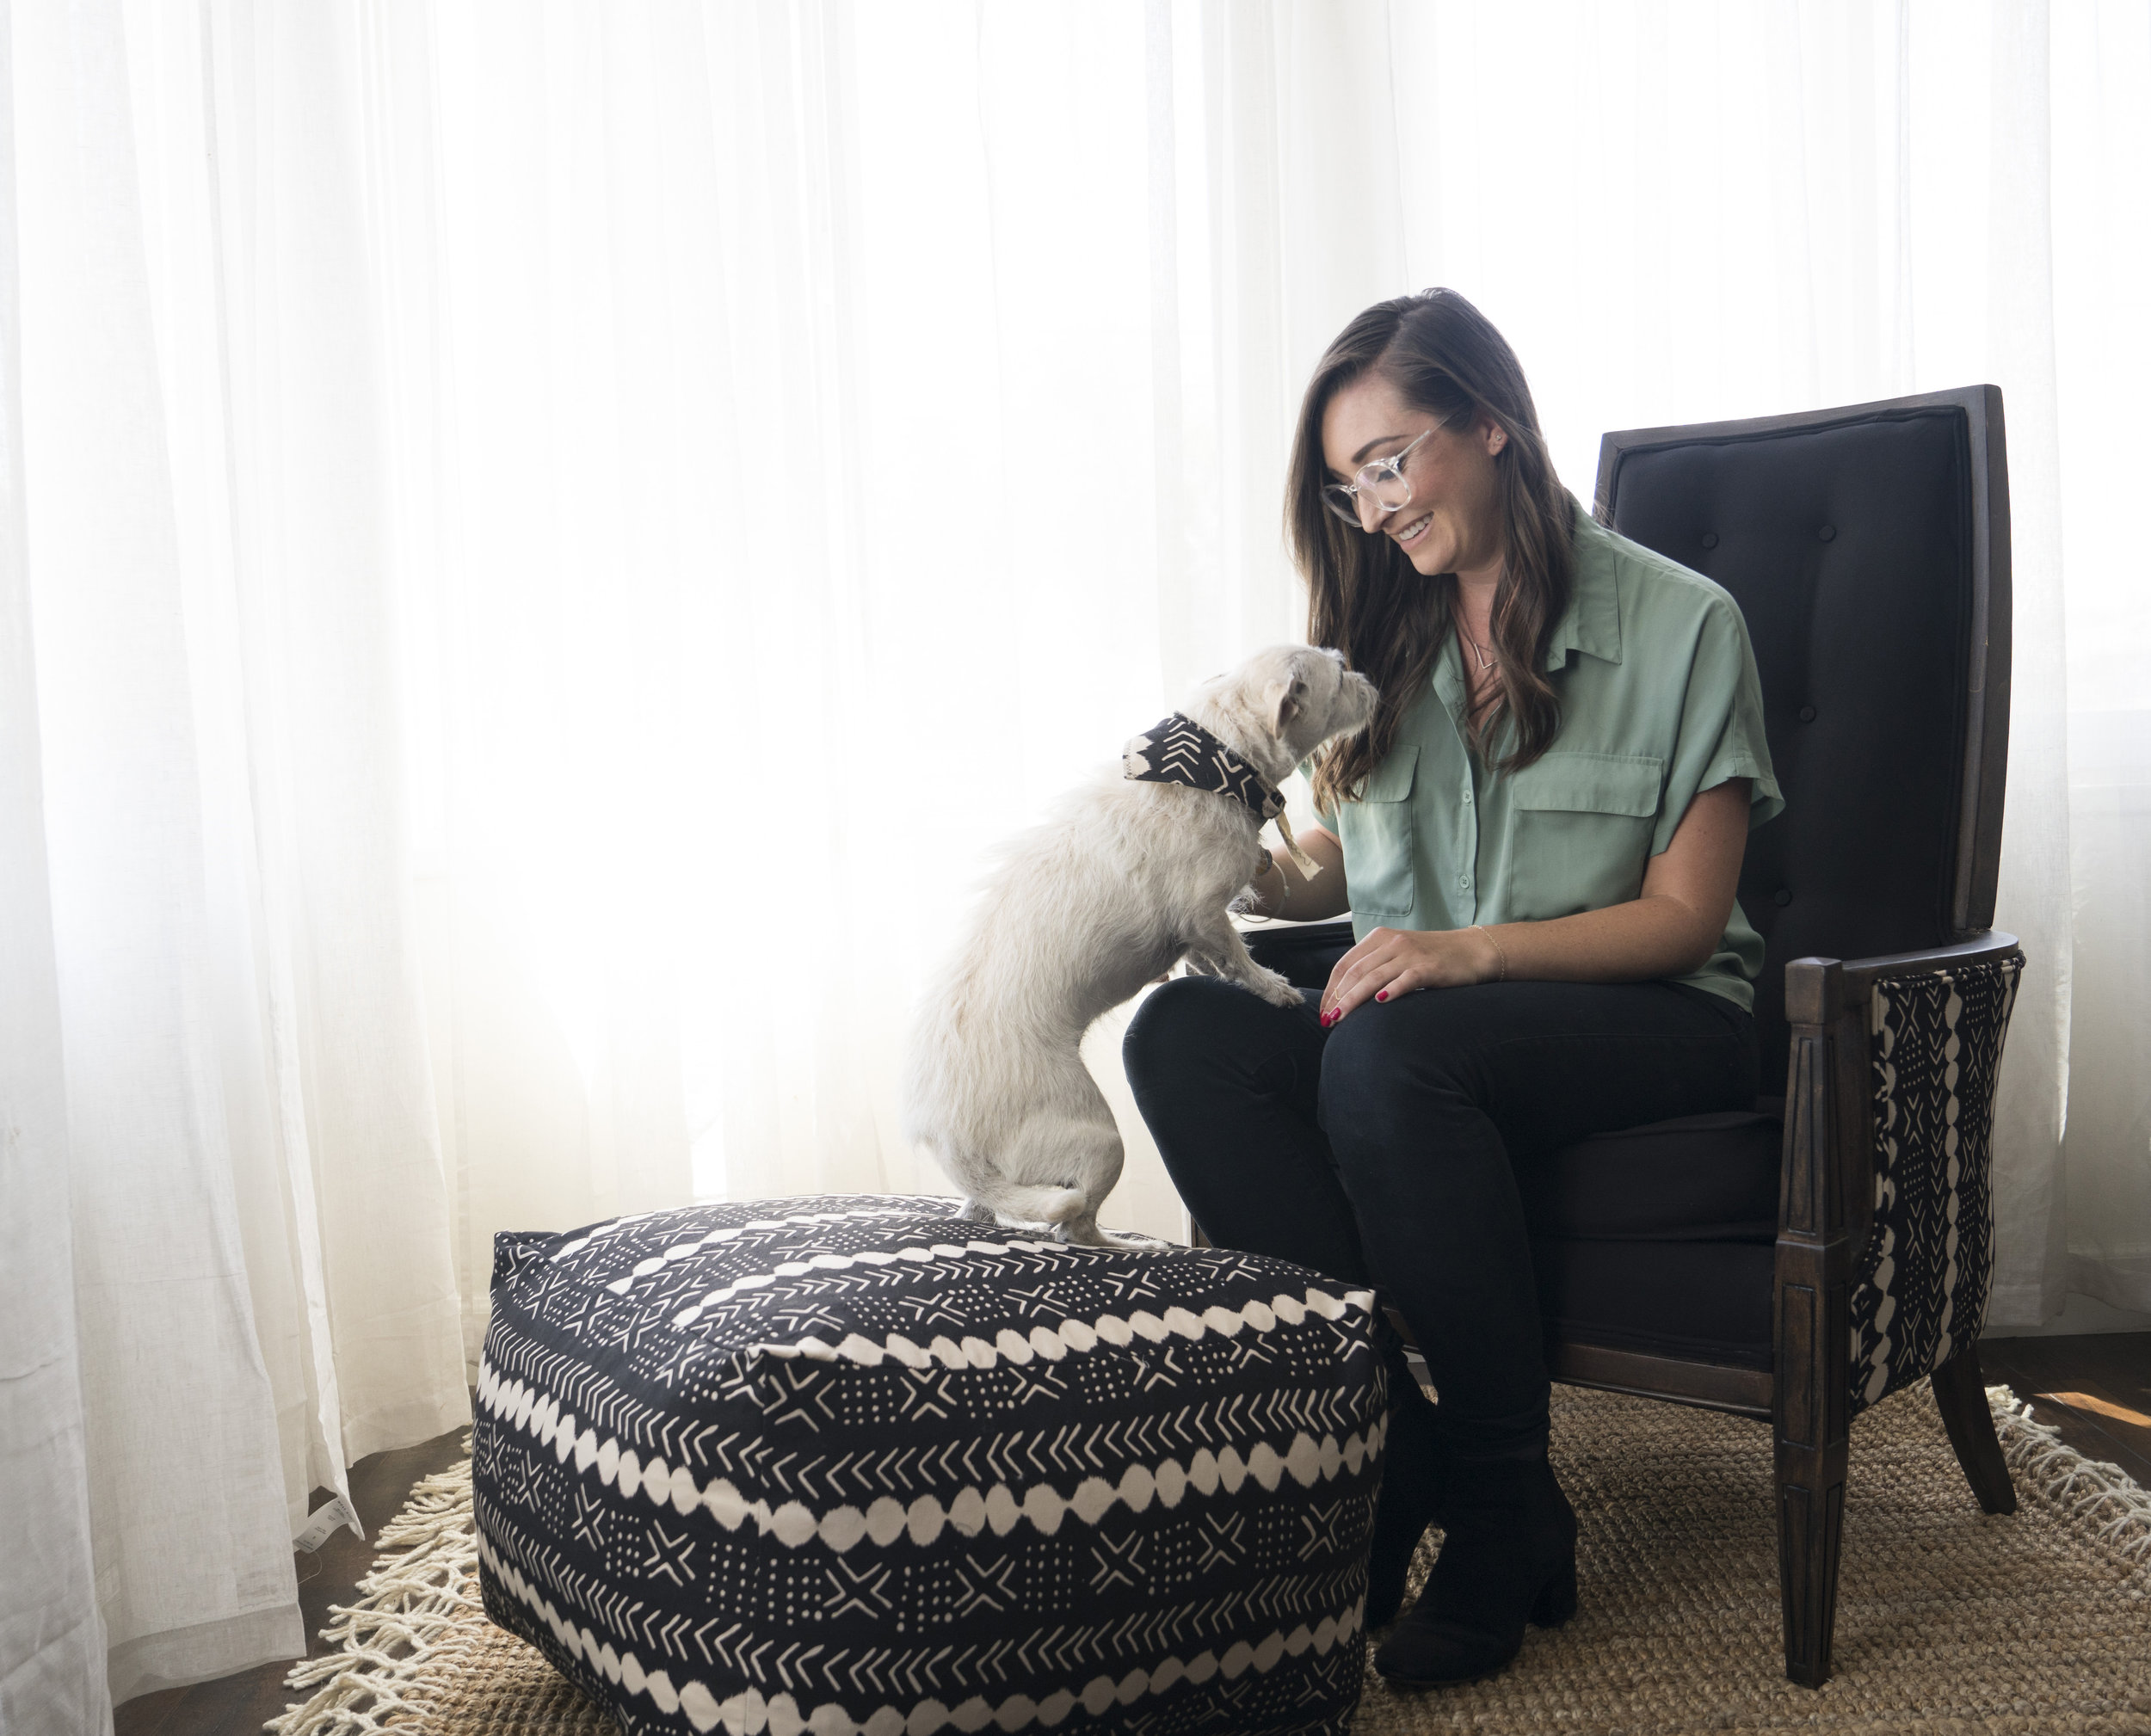 Pebbles armchair and Pebbles pouf